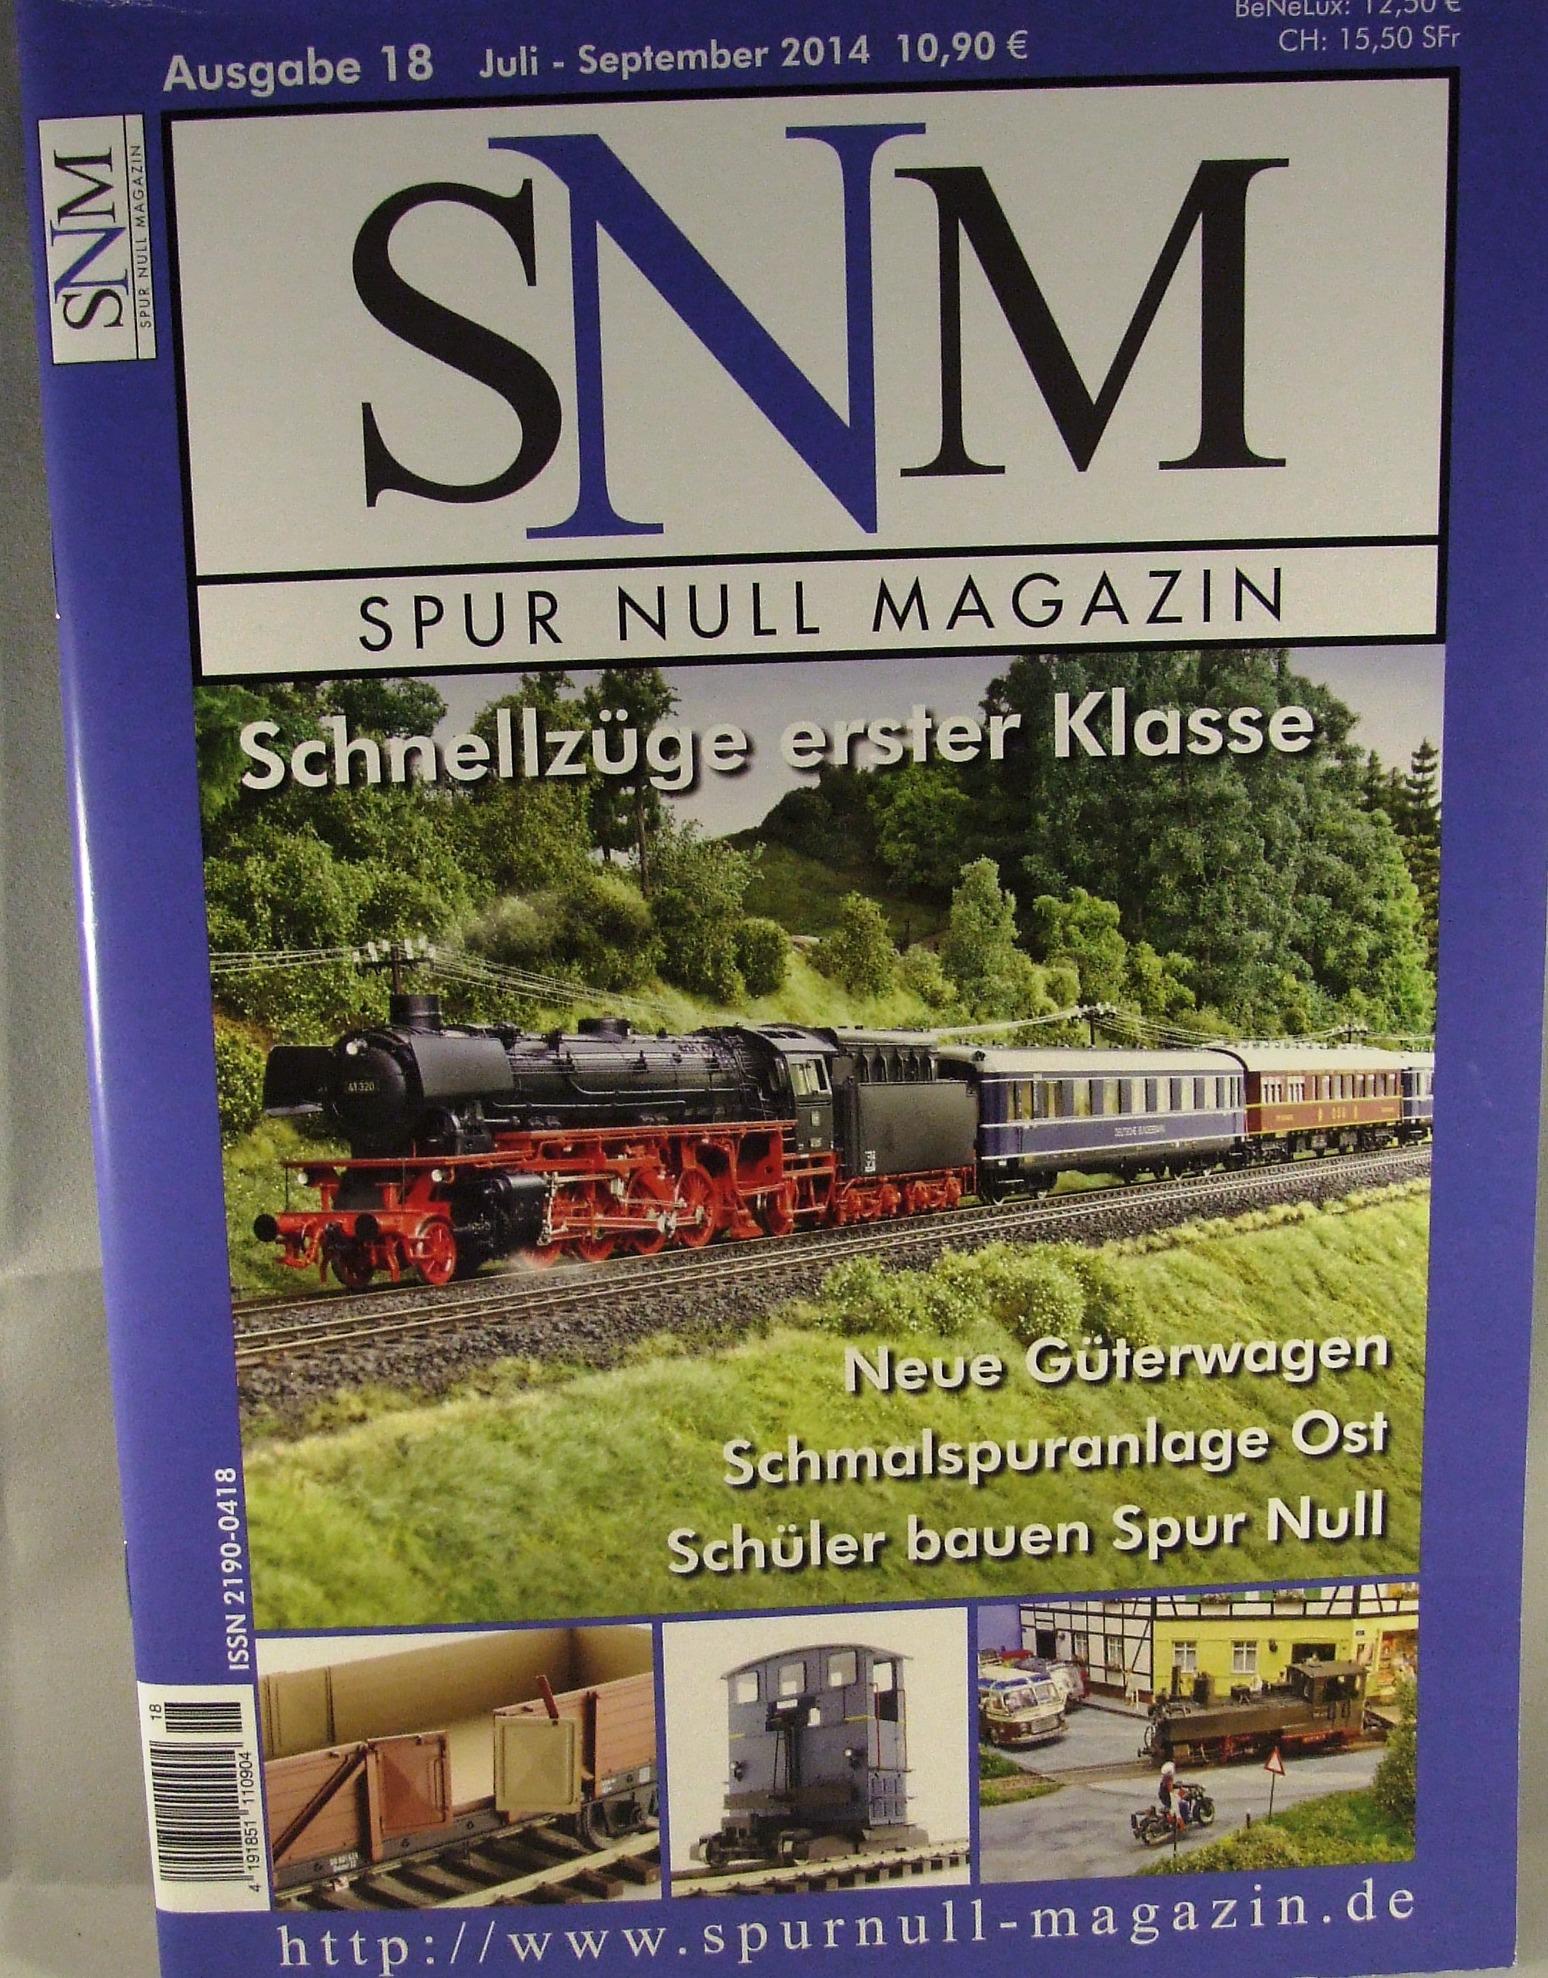 Einzelheft Ausgabe 18 Juli - September 2014 Spur Null Magazin